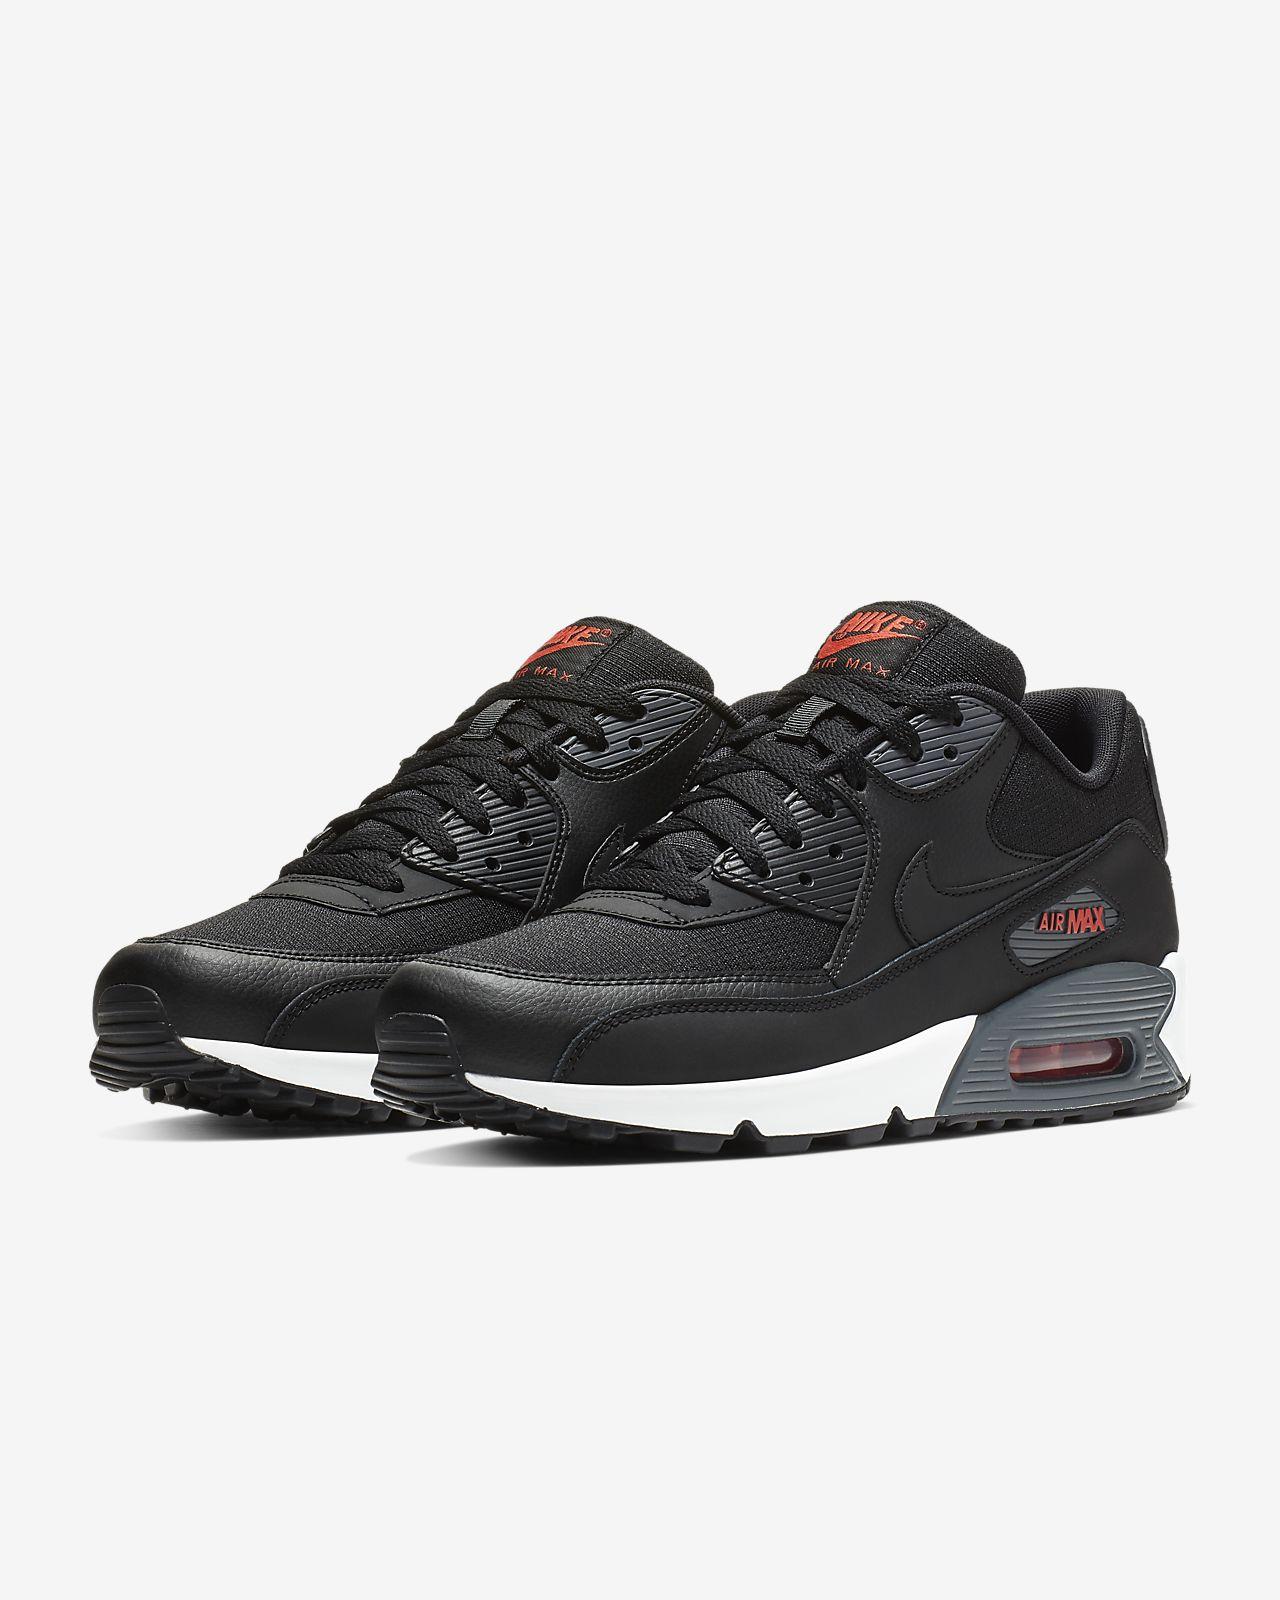 buy online abf3a c5f54 Nike Air Max 90 SE Men s Shoe .